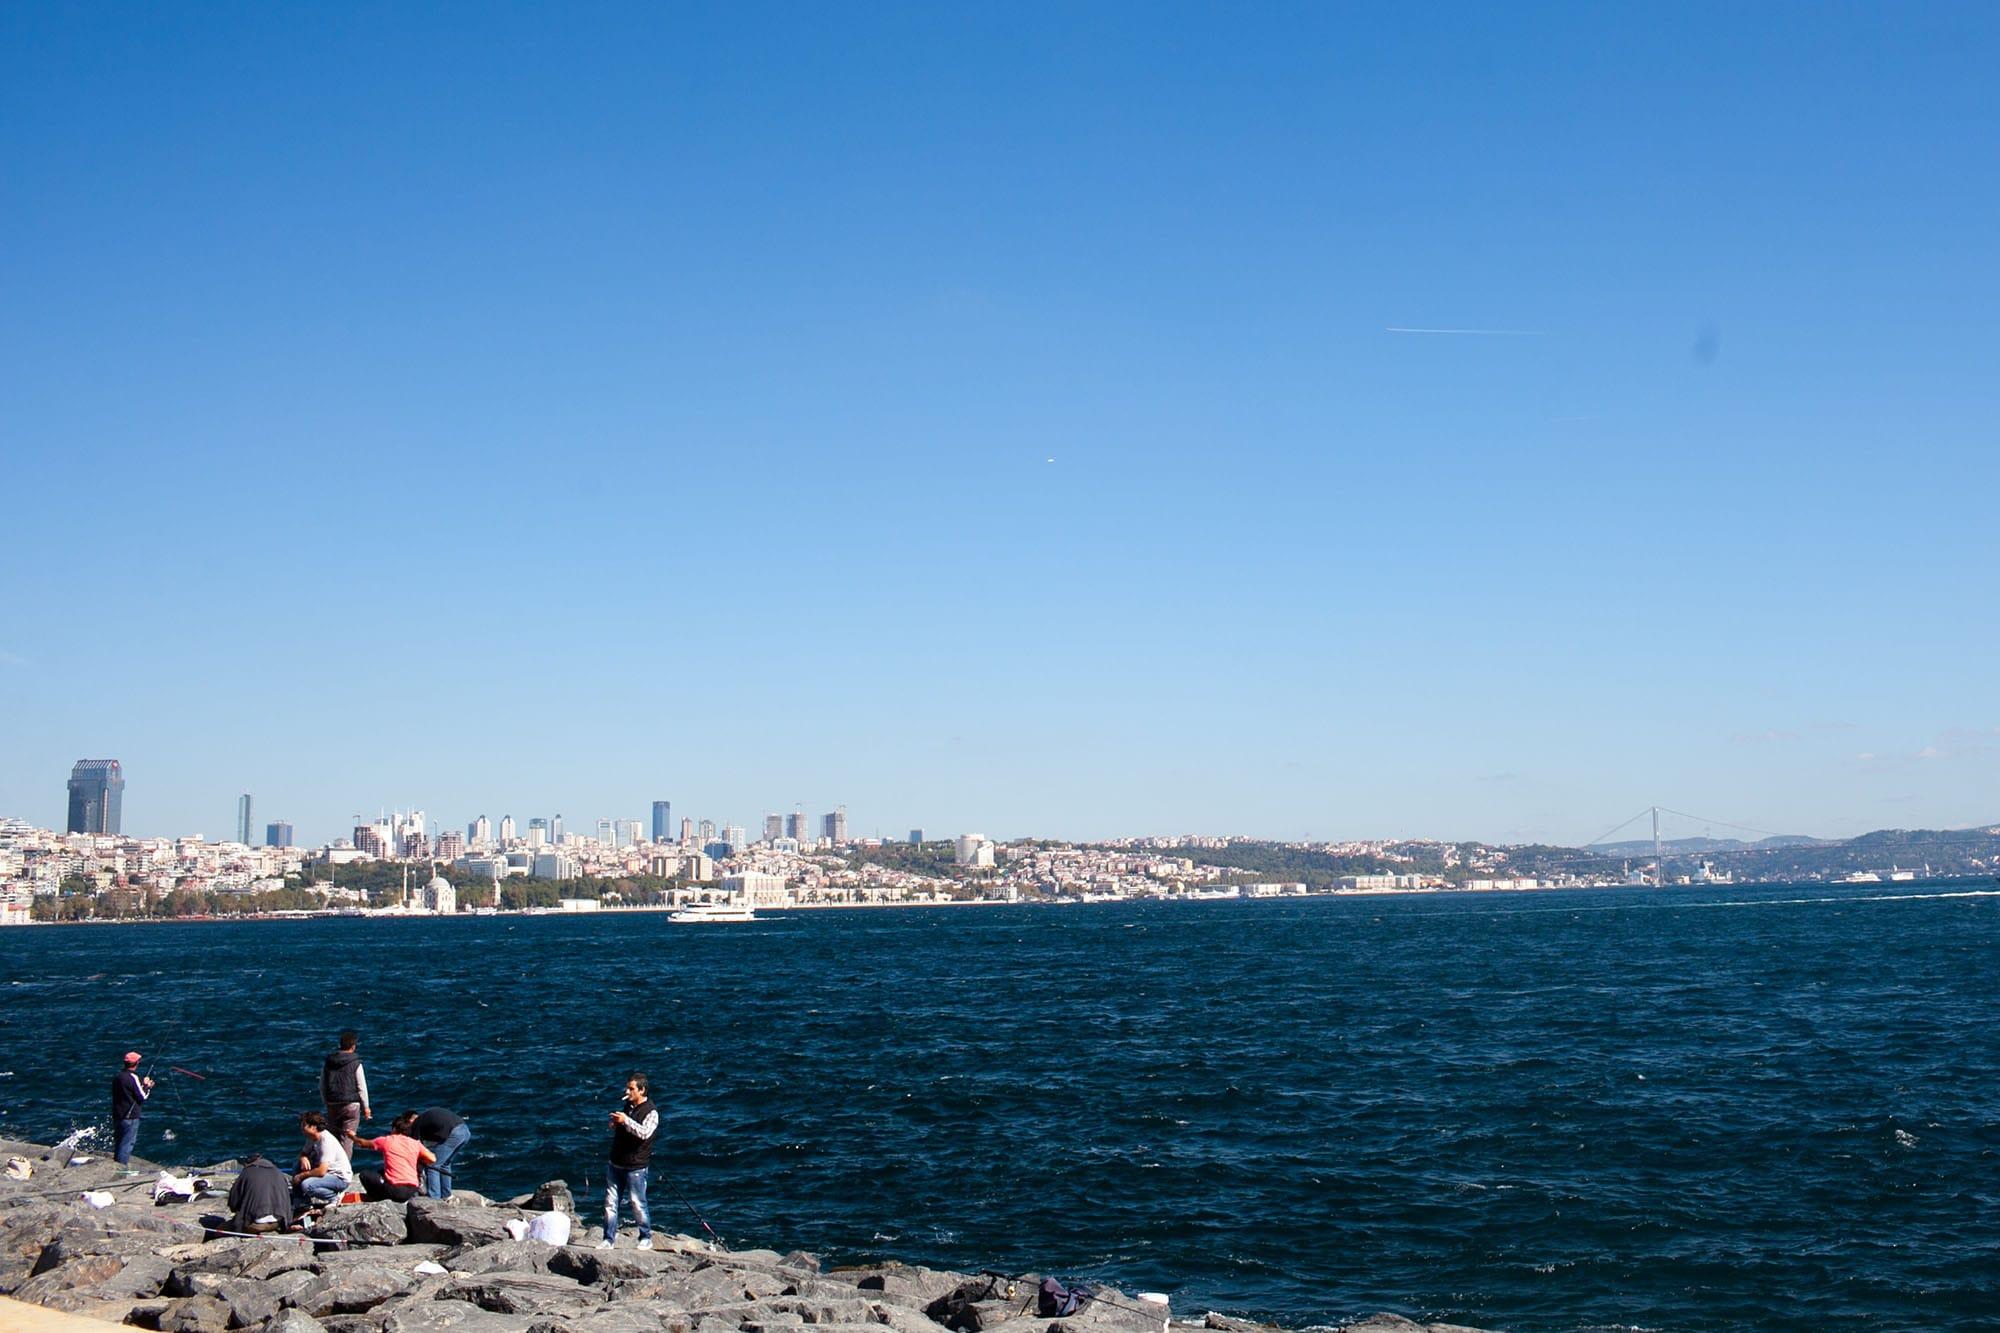 Fishermen on the Bosphorus